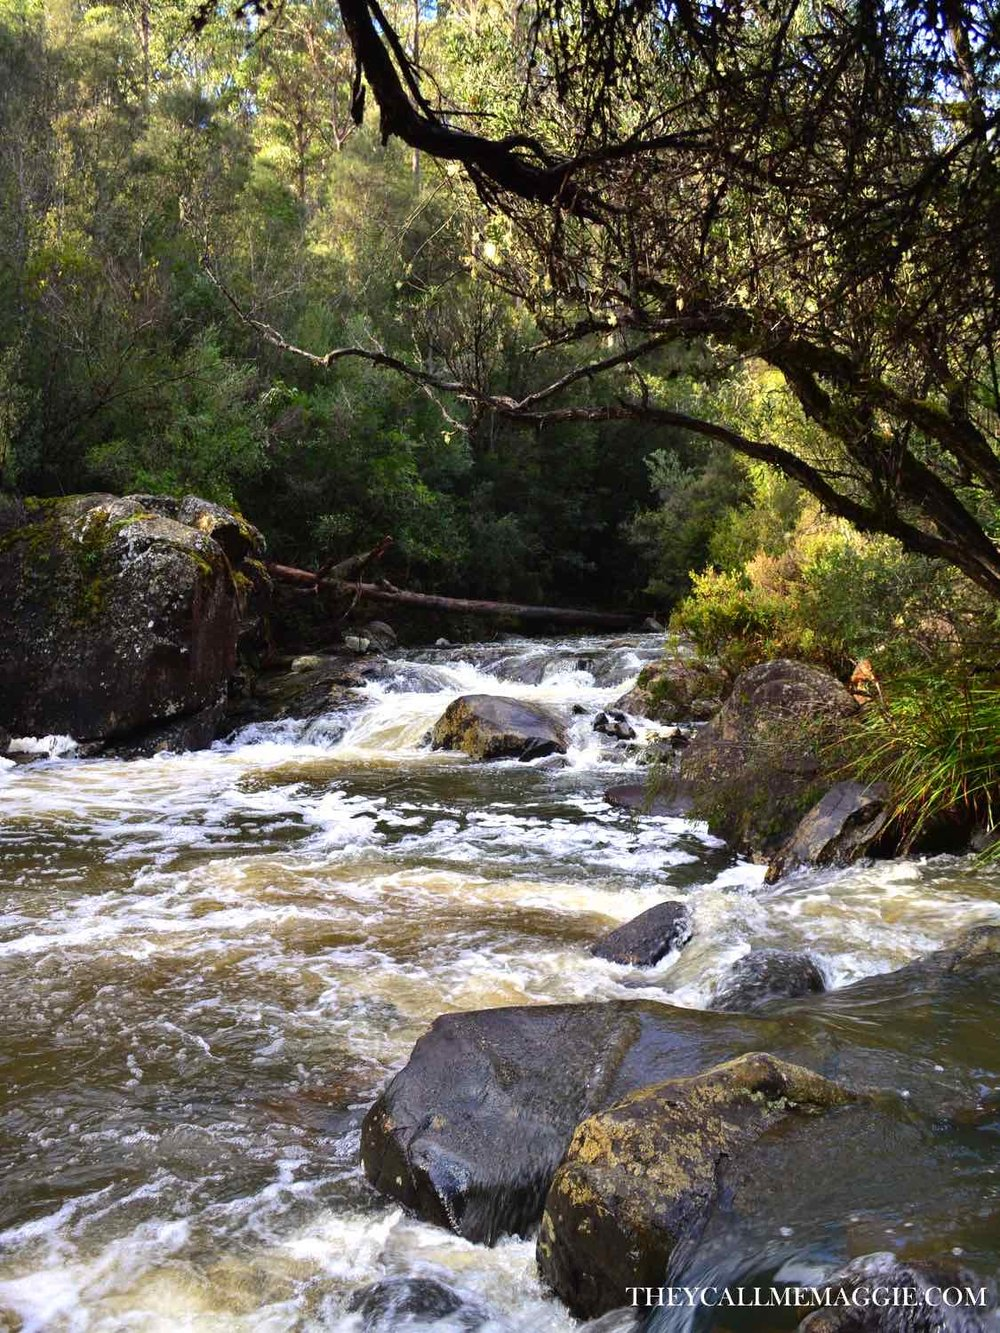 holybank-forest-stream.jpg